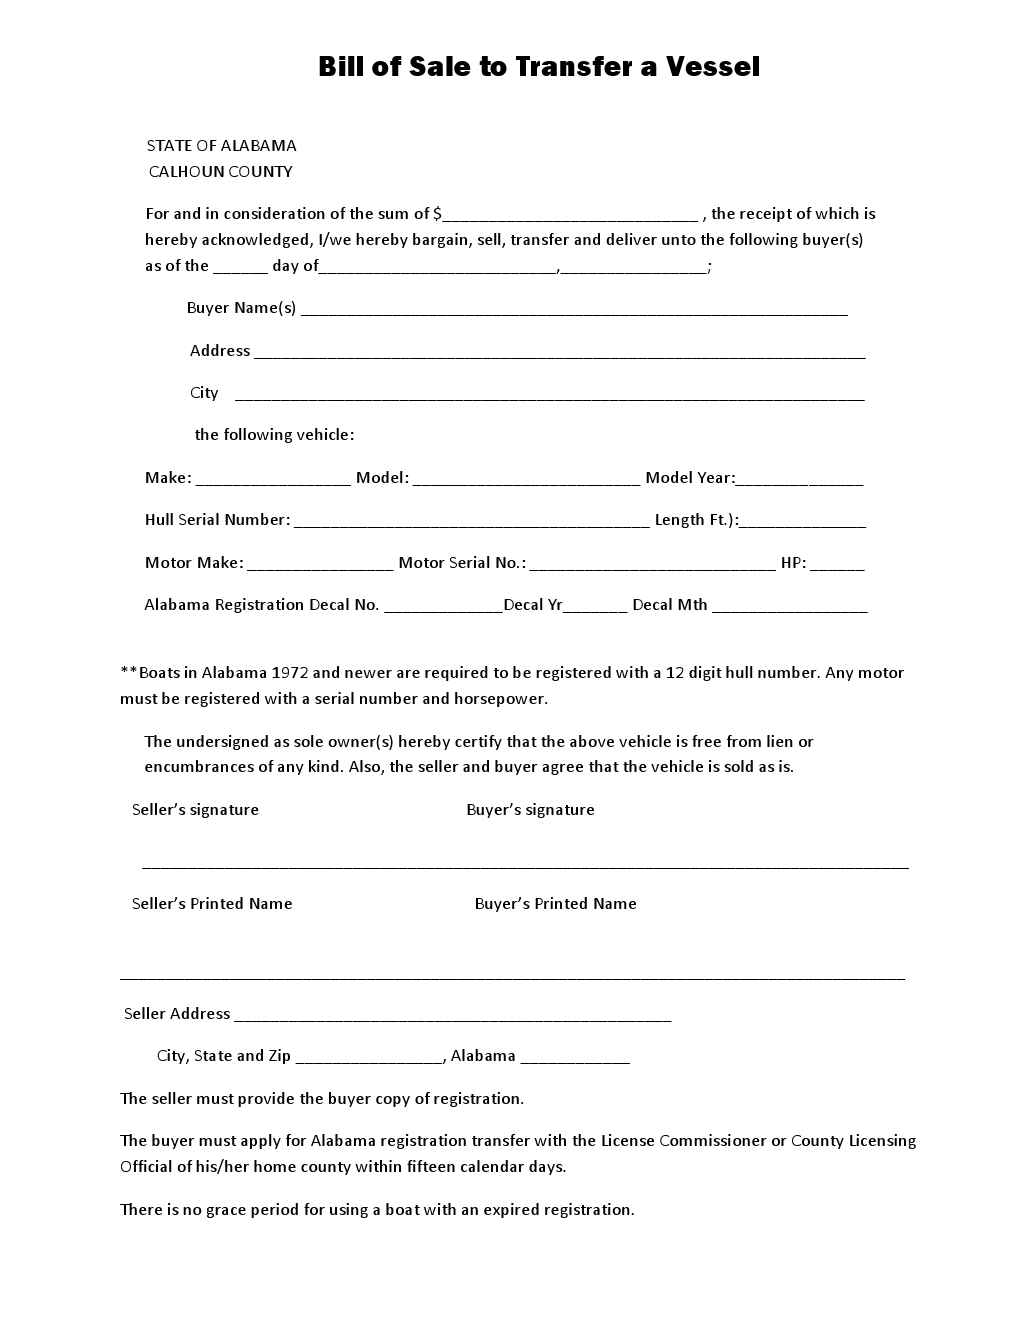 Calhoun County Vessel Bill Of Form